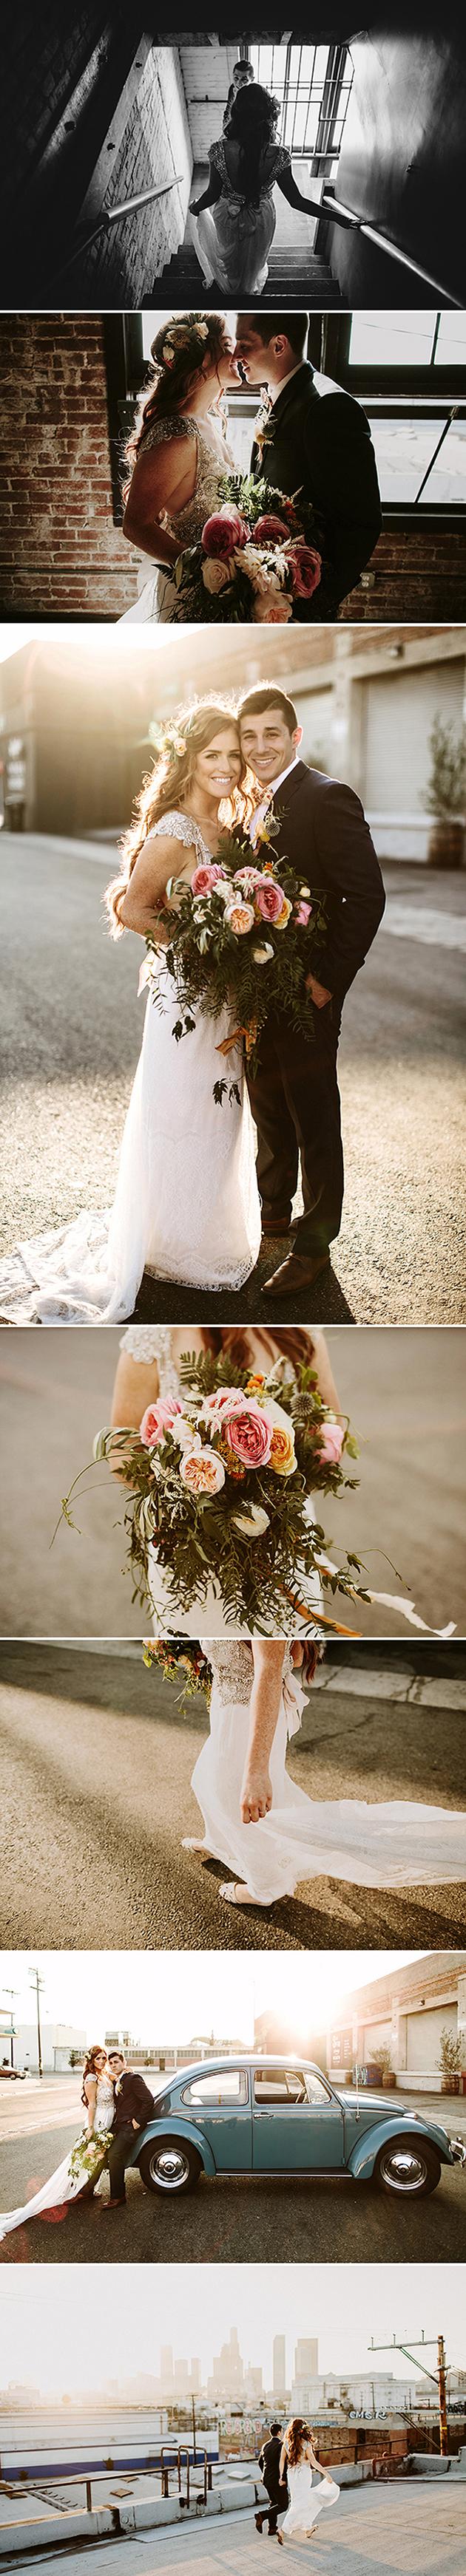 Los Angeles Wedding at 440 Seaton